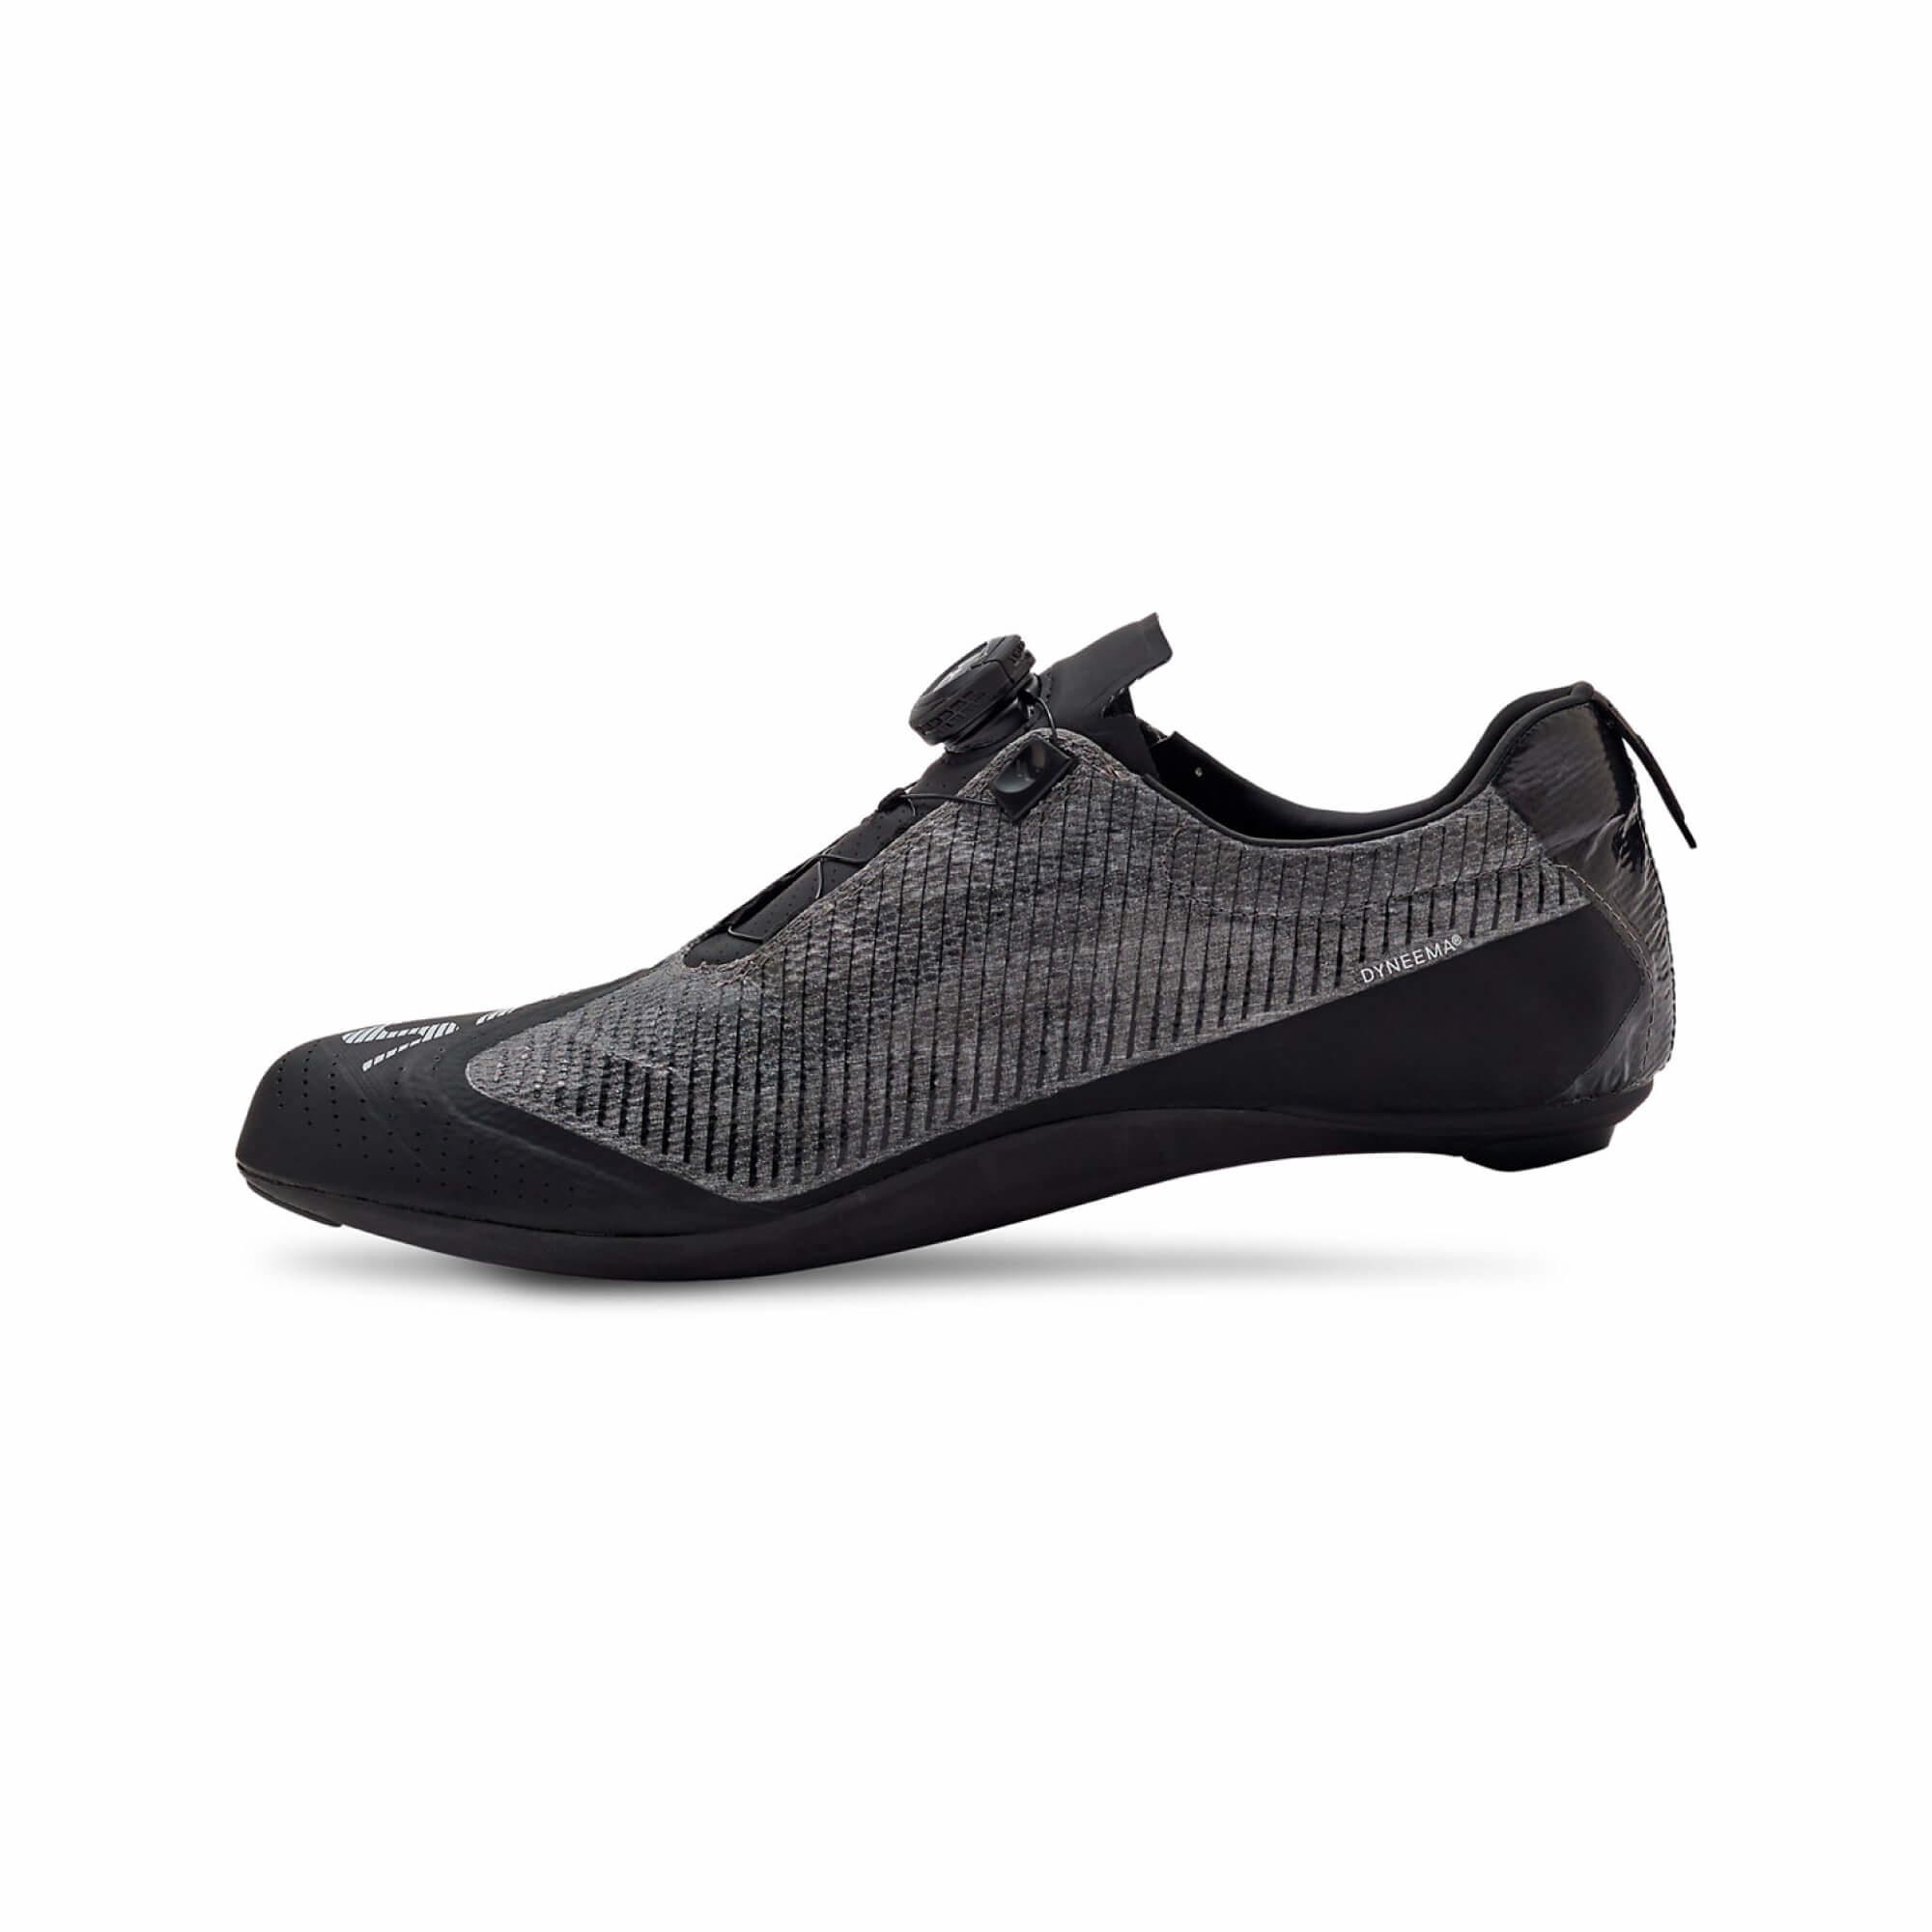 S-Works EXOS Road Shoe-3